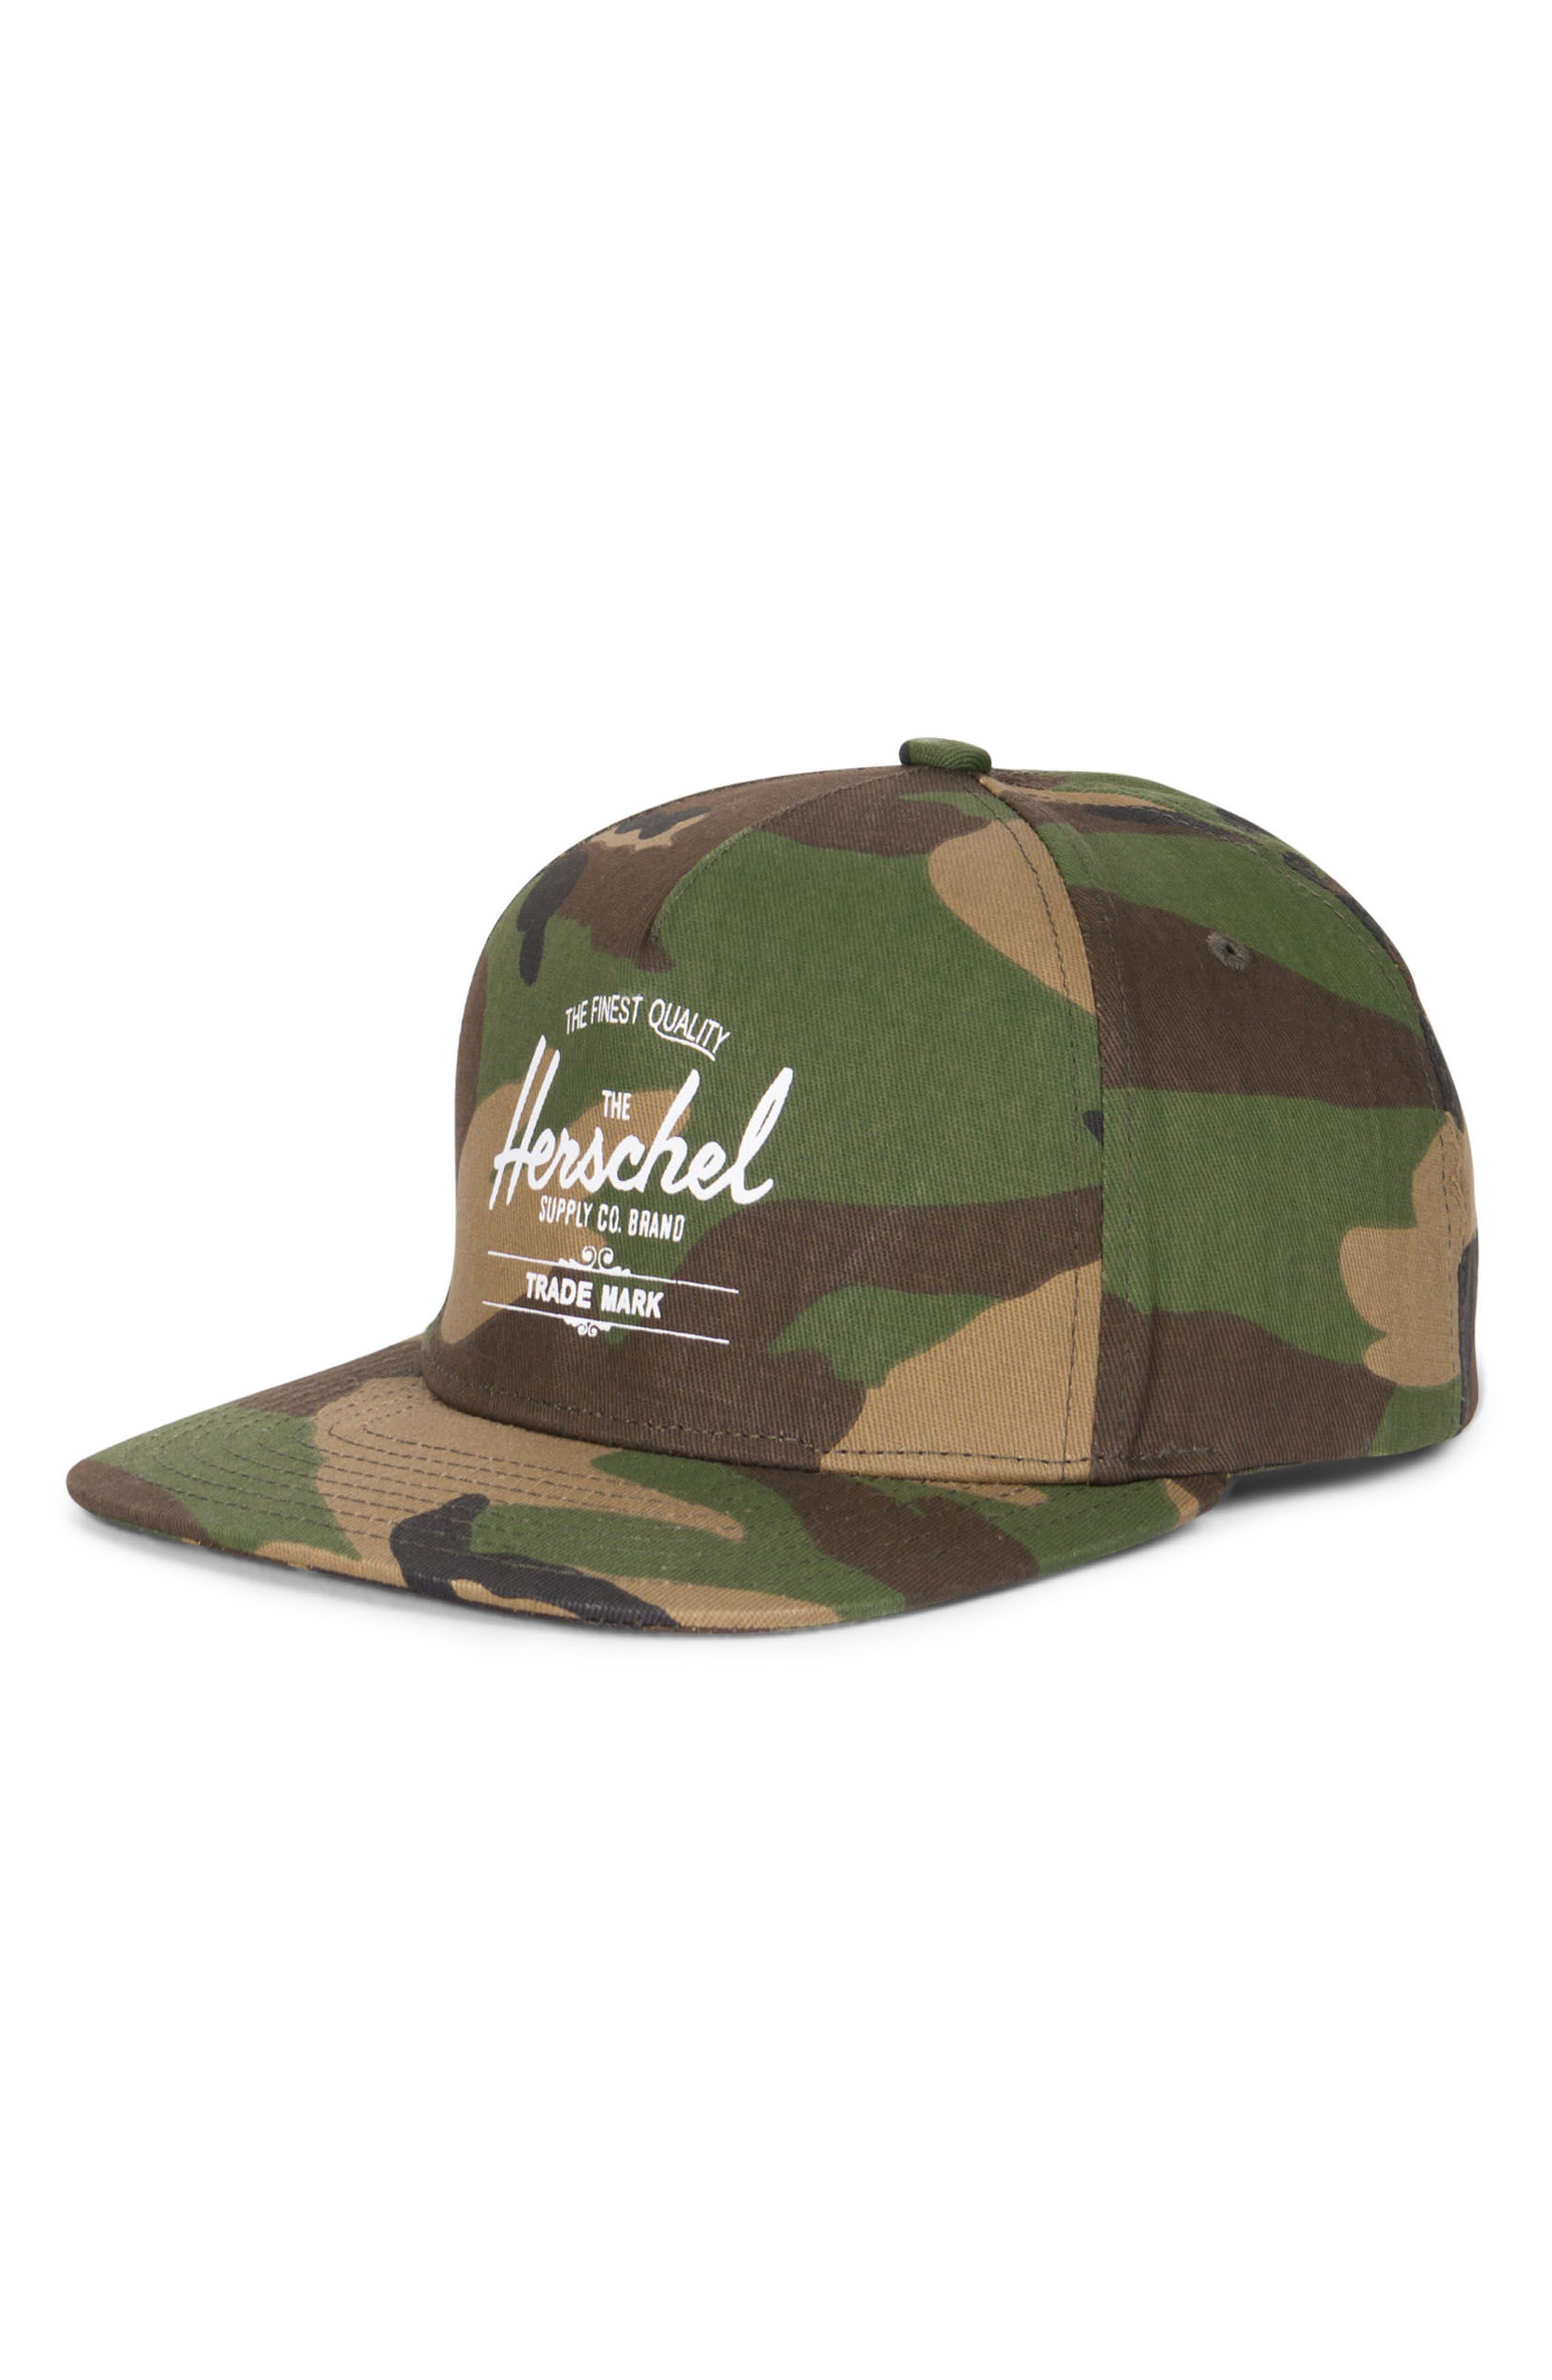 Alternate Image 1 Selected - Herschel Supply Co. Whaler Snapback Baseball Cap